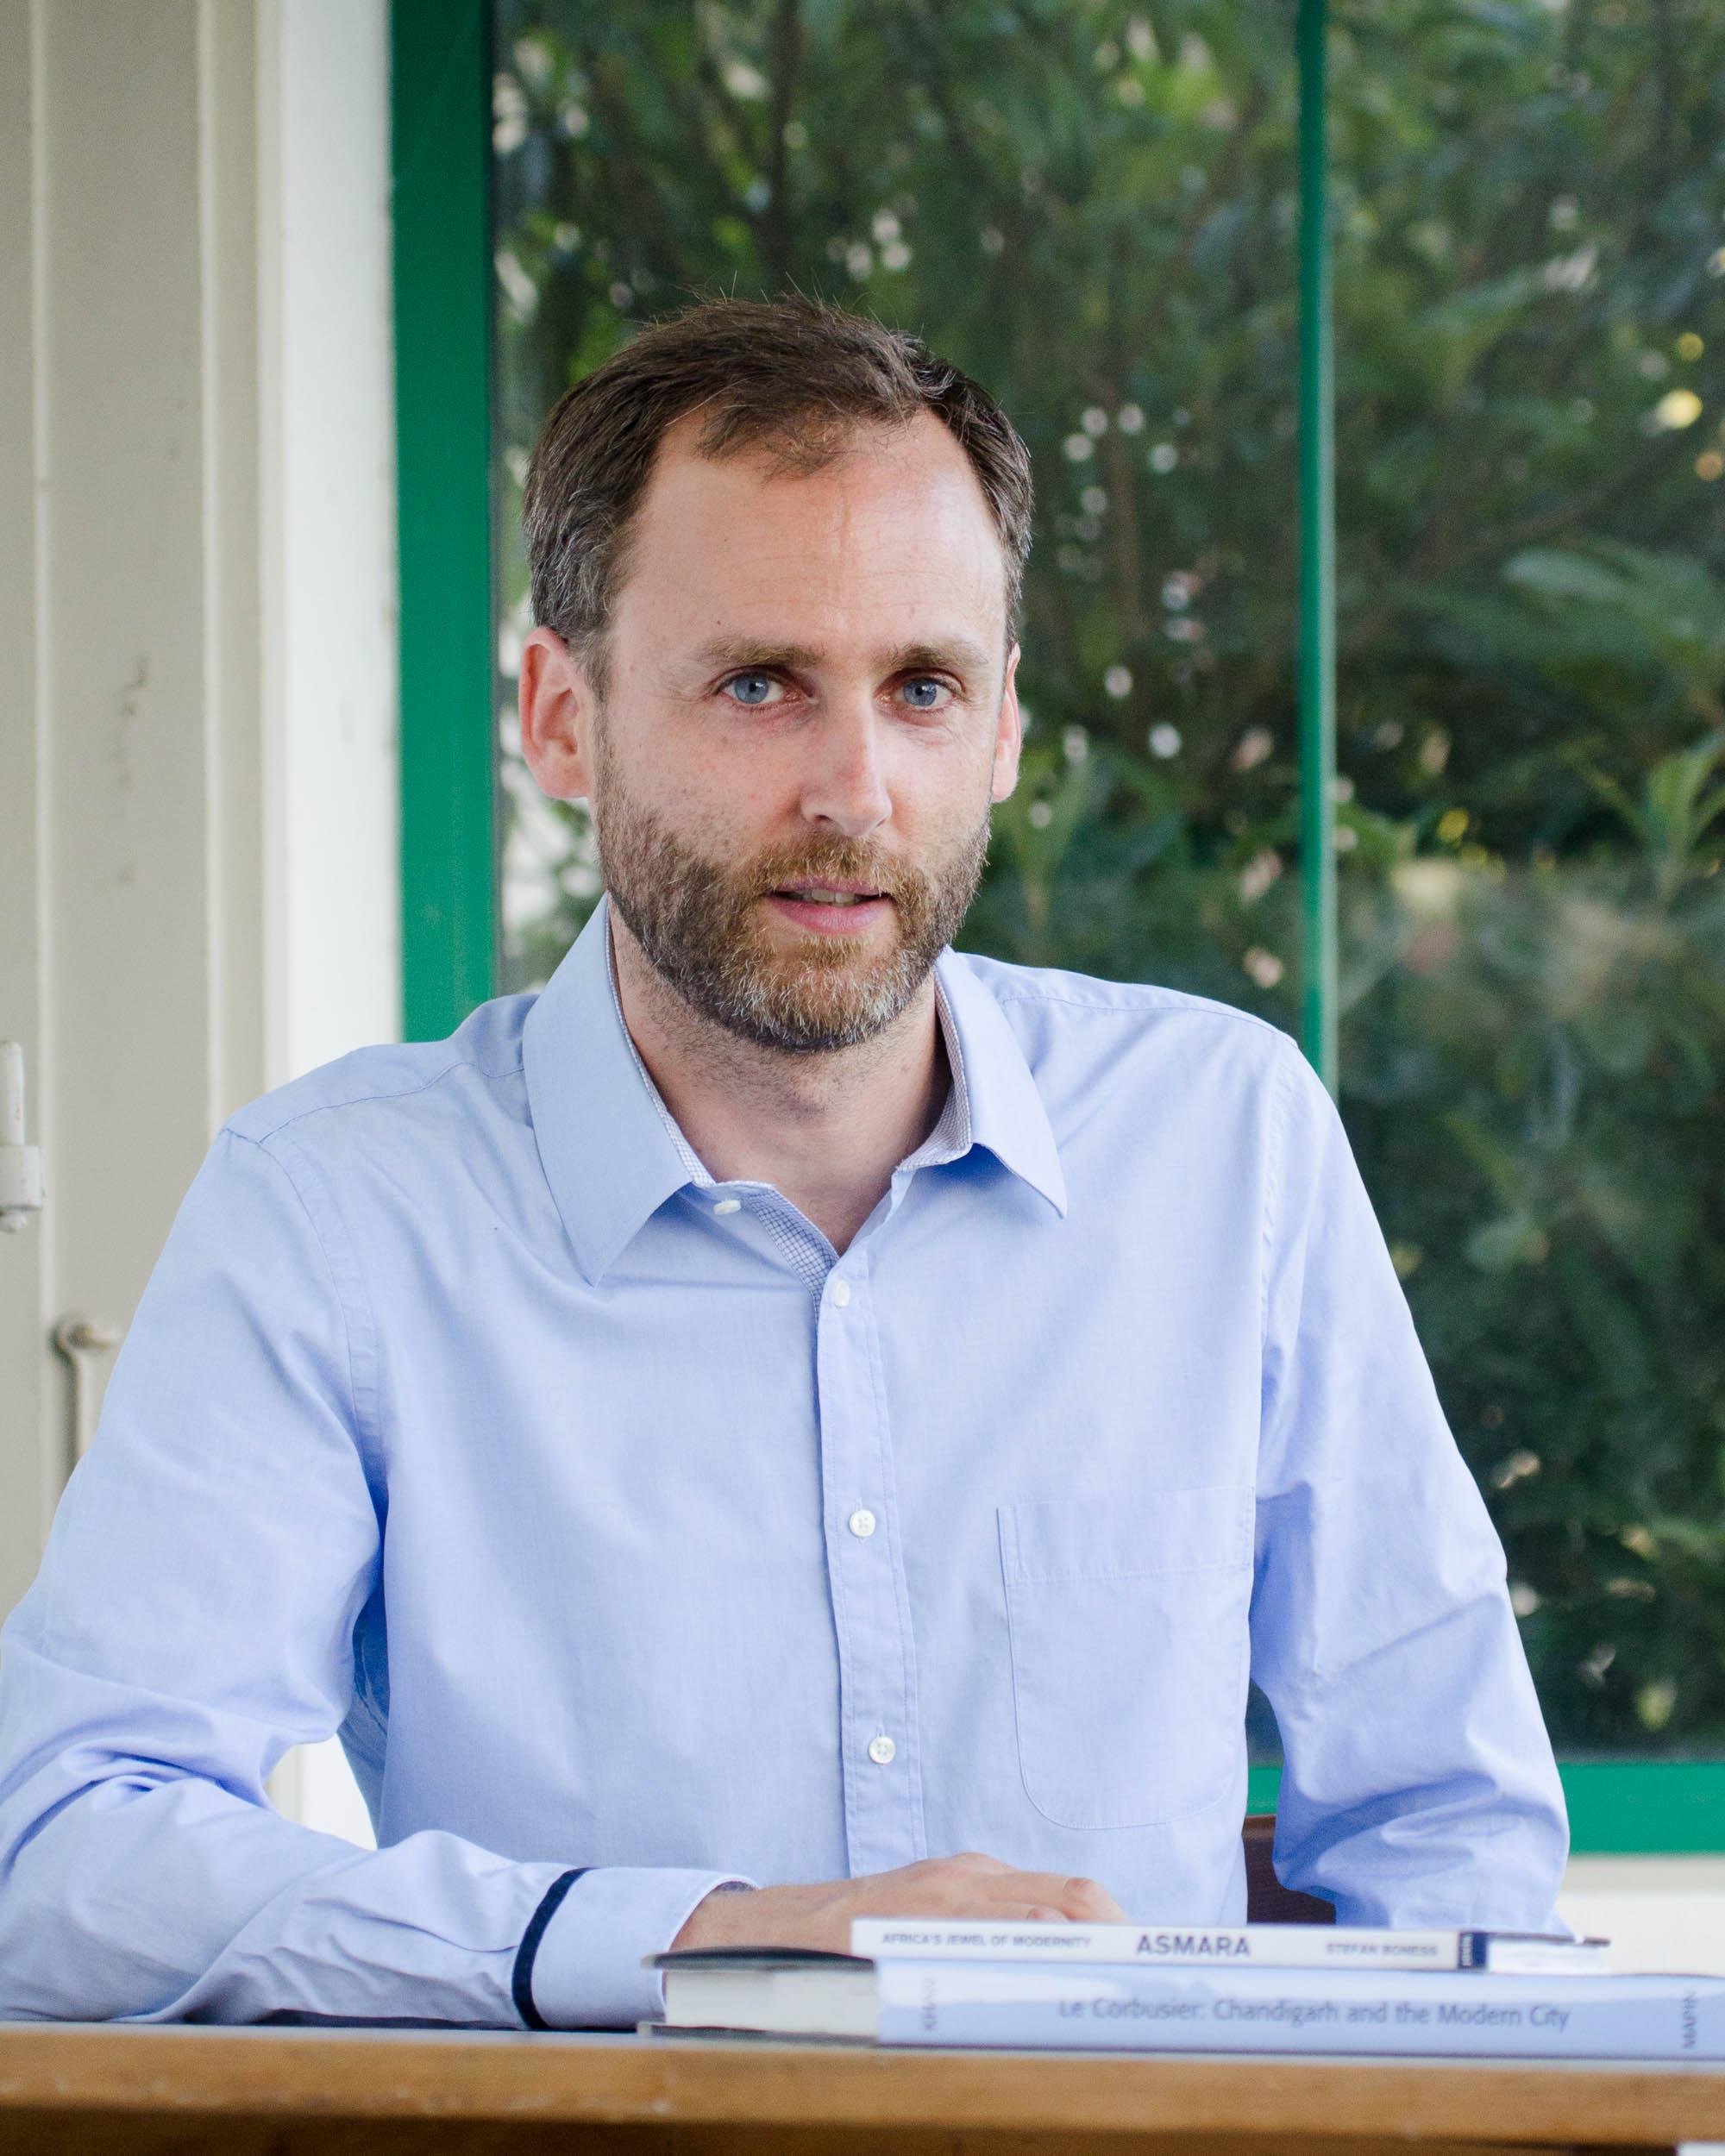 Prof. Dr. Jean-David Gerber